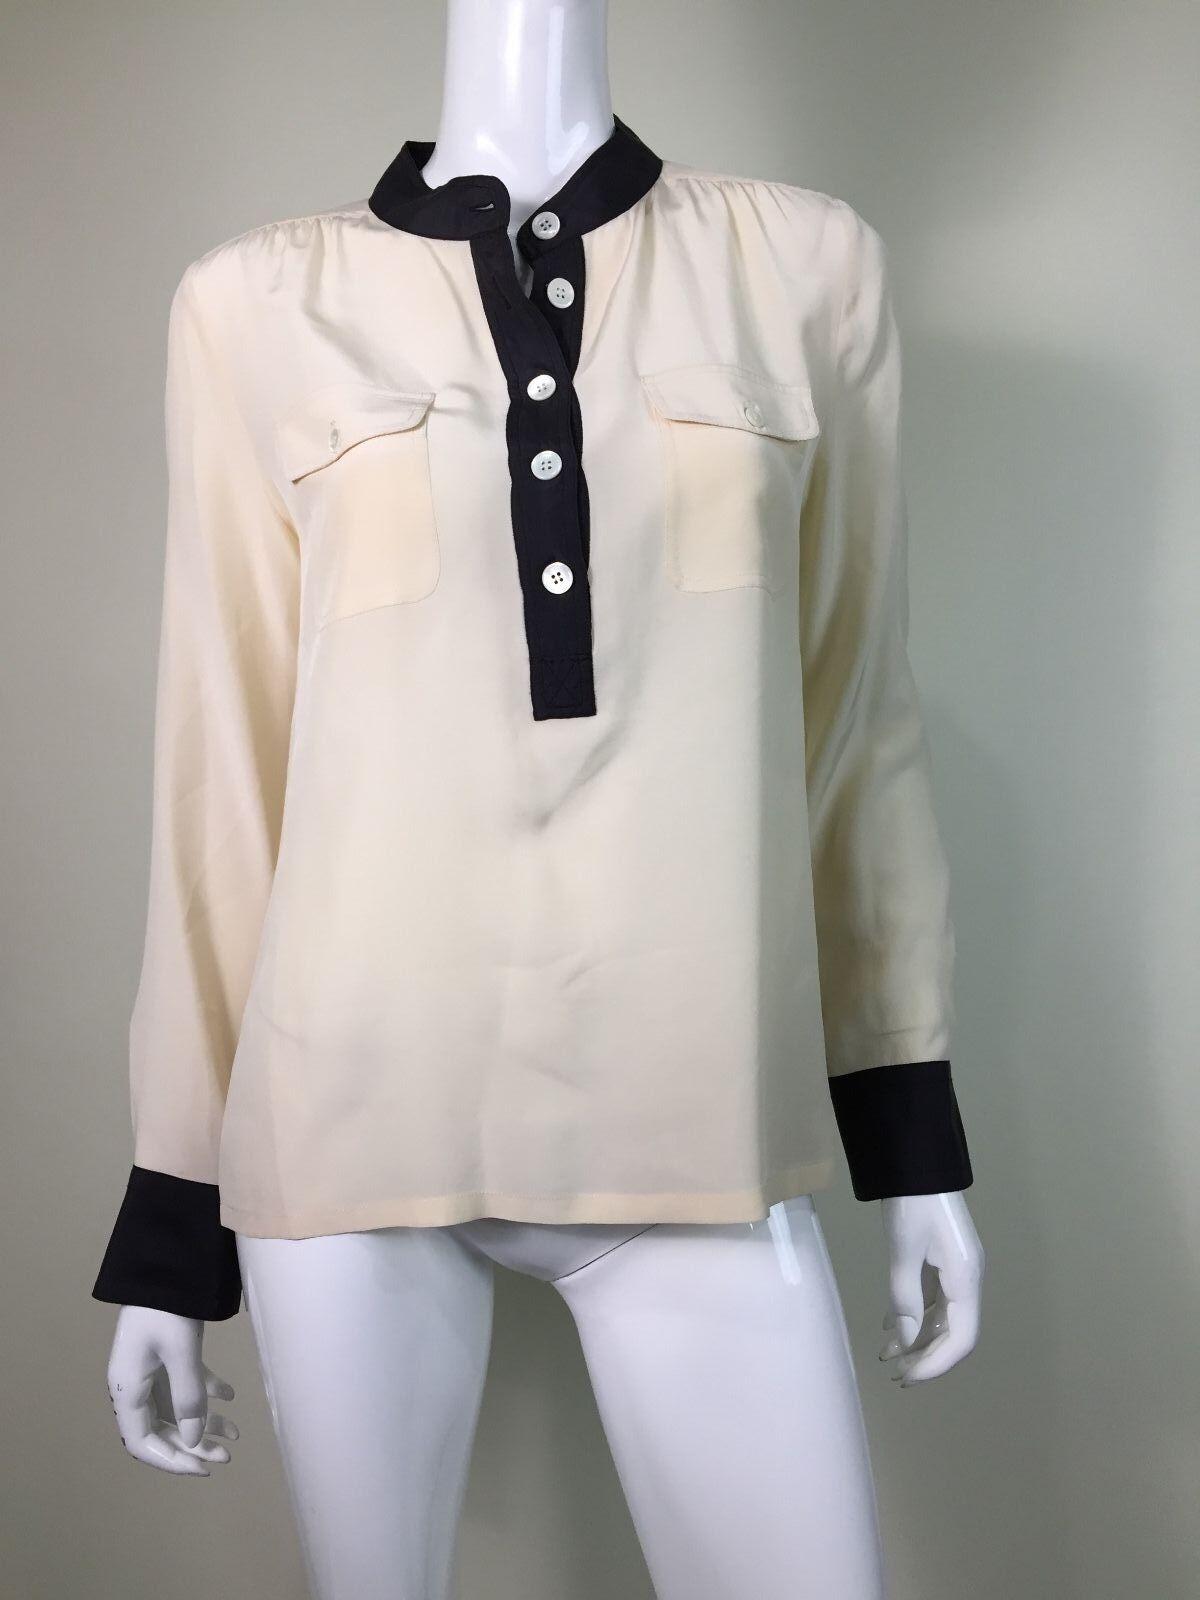 Изображение товара J. Crew Women's White Black Silk Long Sleeve Button Front Blouse Top Shirt SZ 6